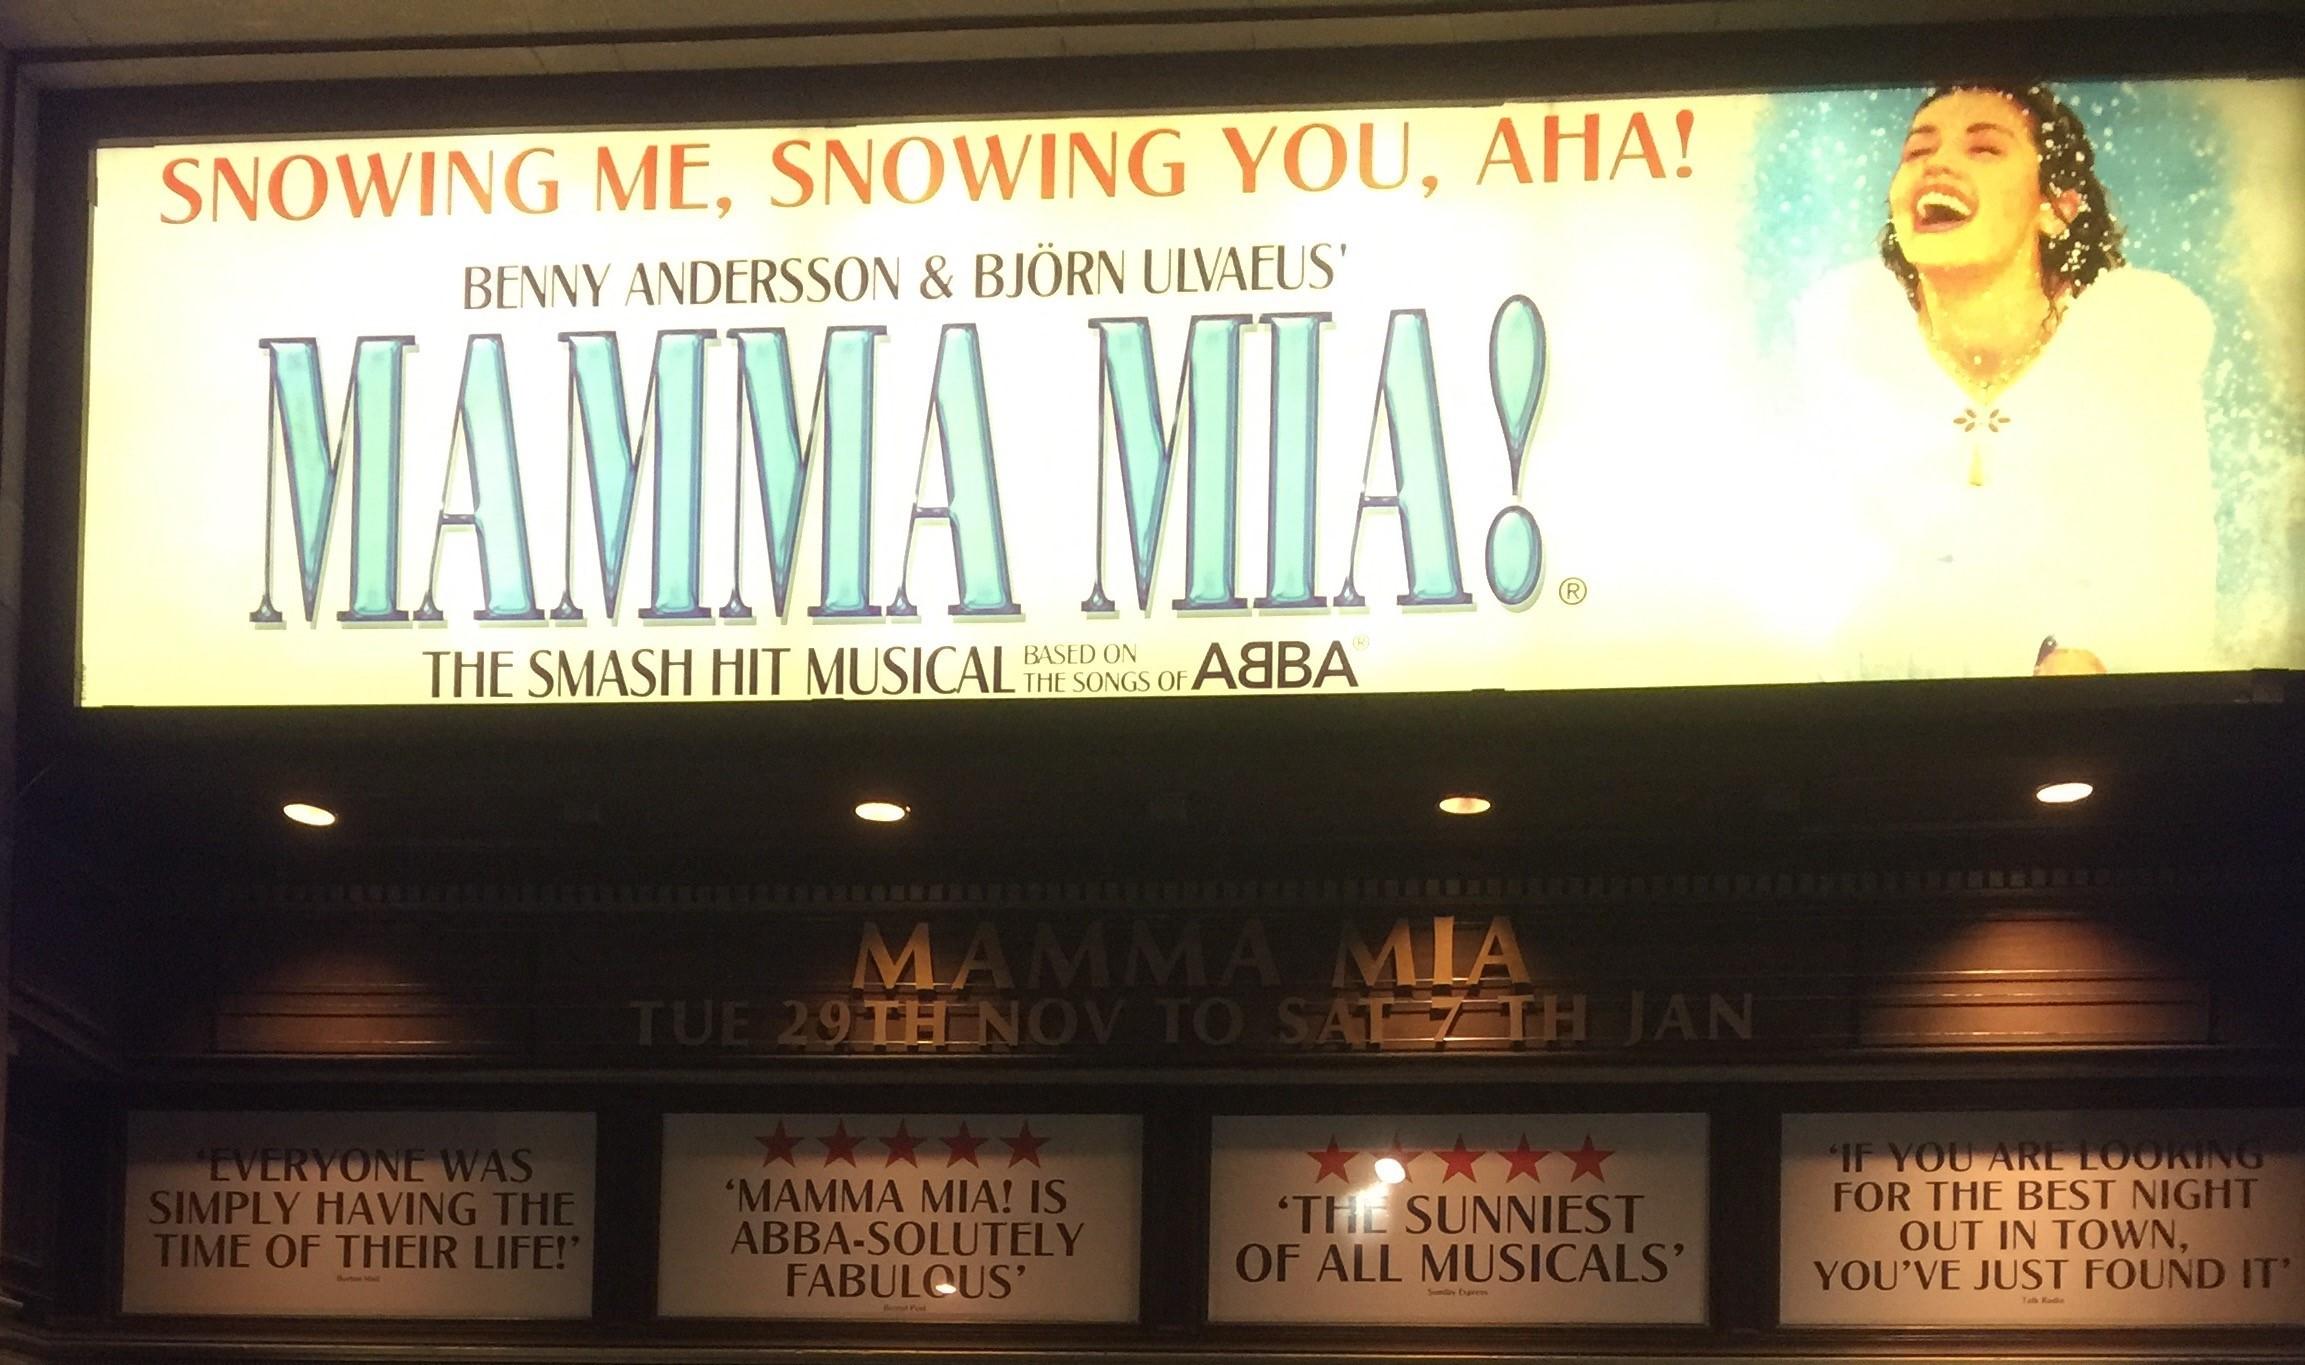 Press Launch of smash hit musical Mama Mia! at Edinburgh Playhouse, Scotland